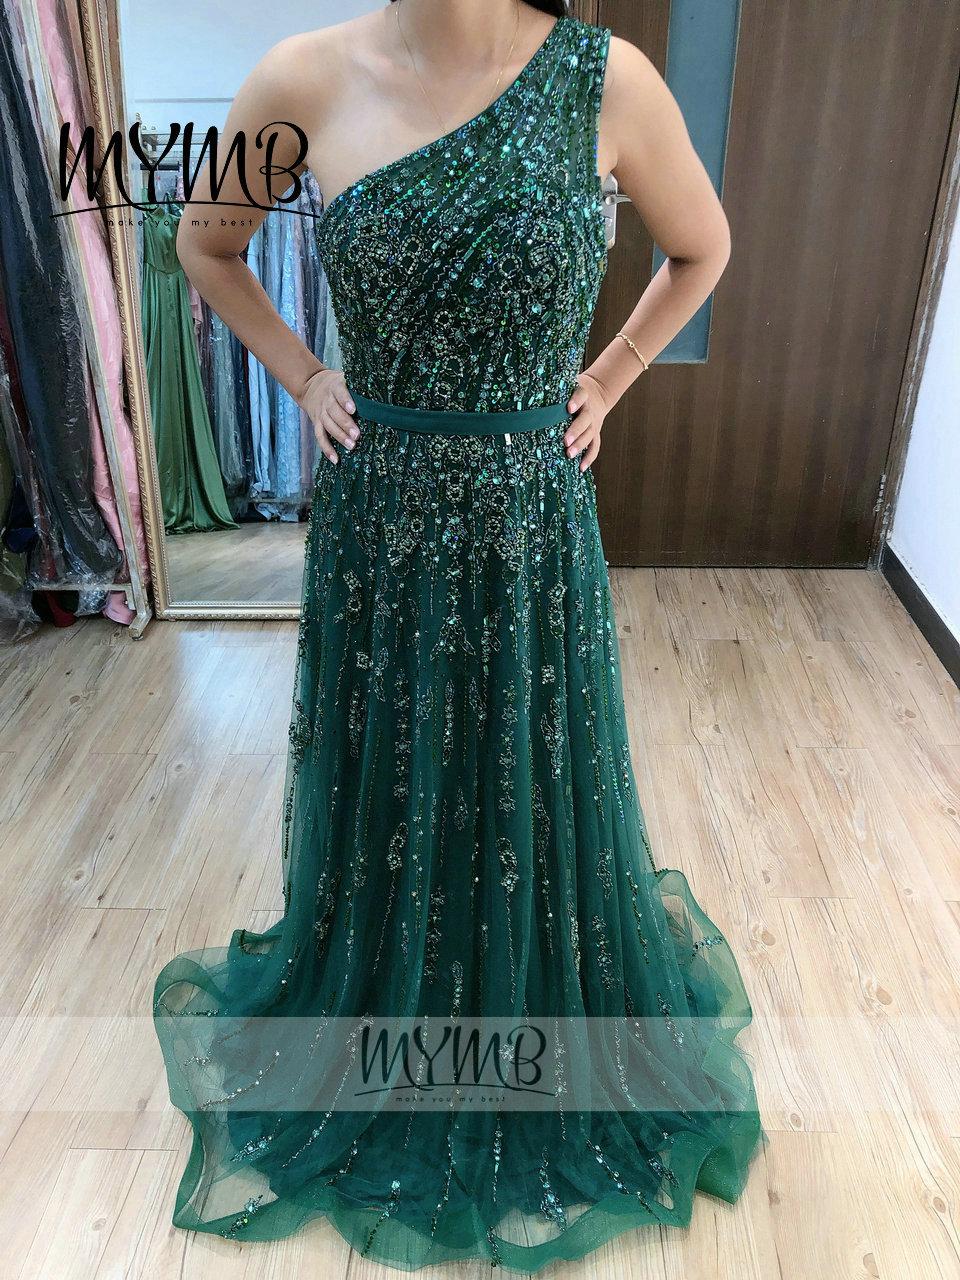 MYMB-فستان سهرة أخضر زمردي ، غير متماثل ، كتف عاري ، ملابس نسائية مصممة ، MY21116 ، 2021